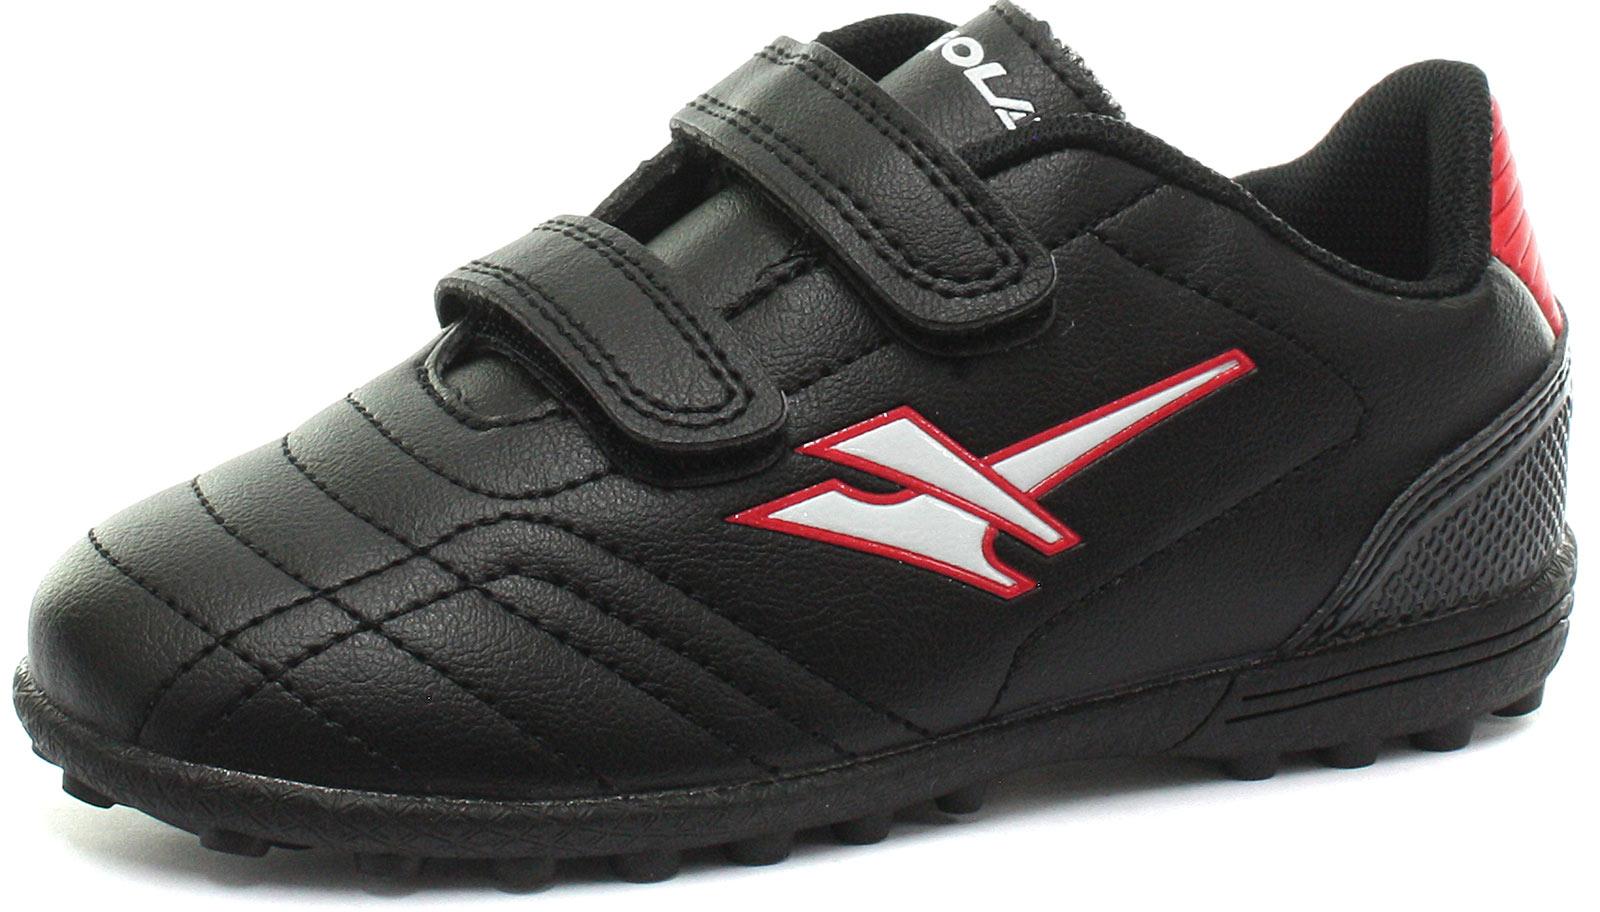 Barre Turf Twin Ativo Gola Vx Enfants 5 De Magnaz Foot Chaussures wZ0Bfq